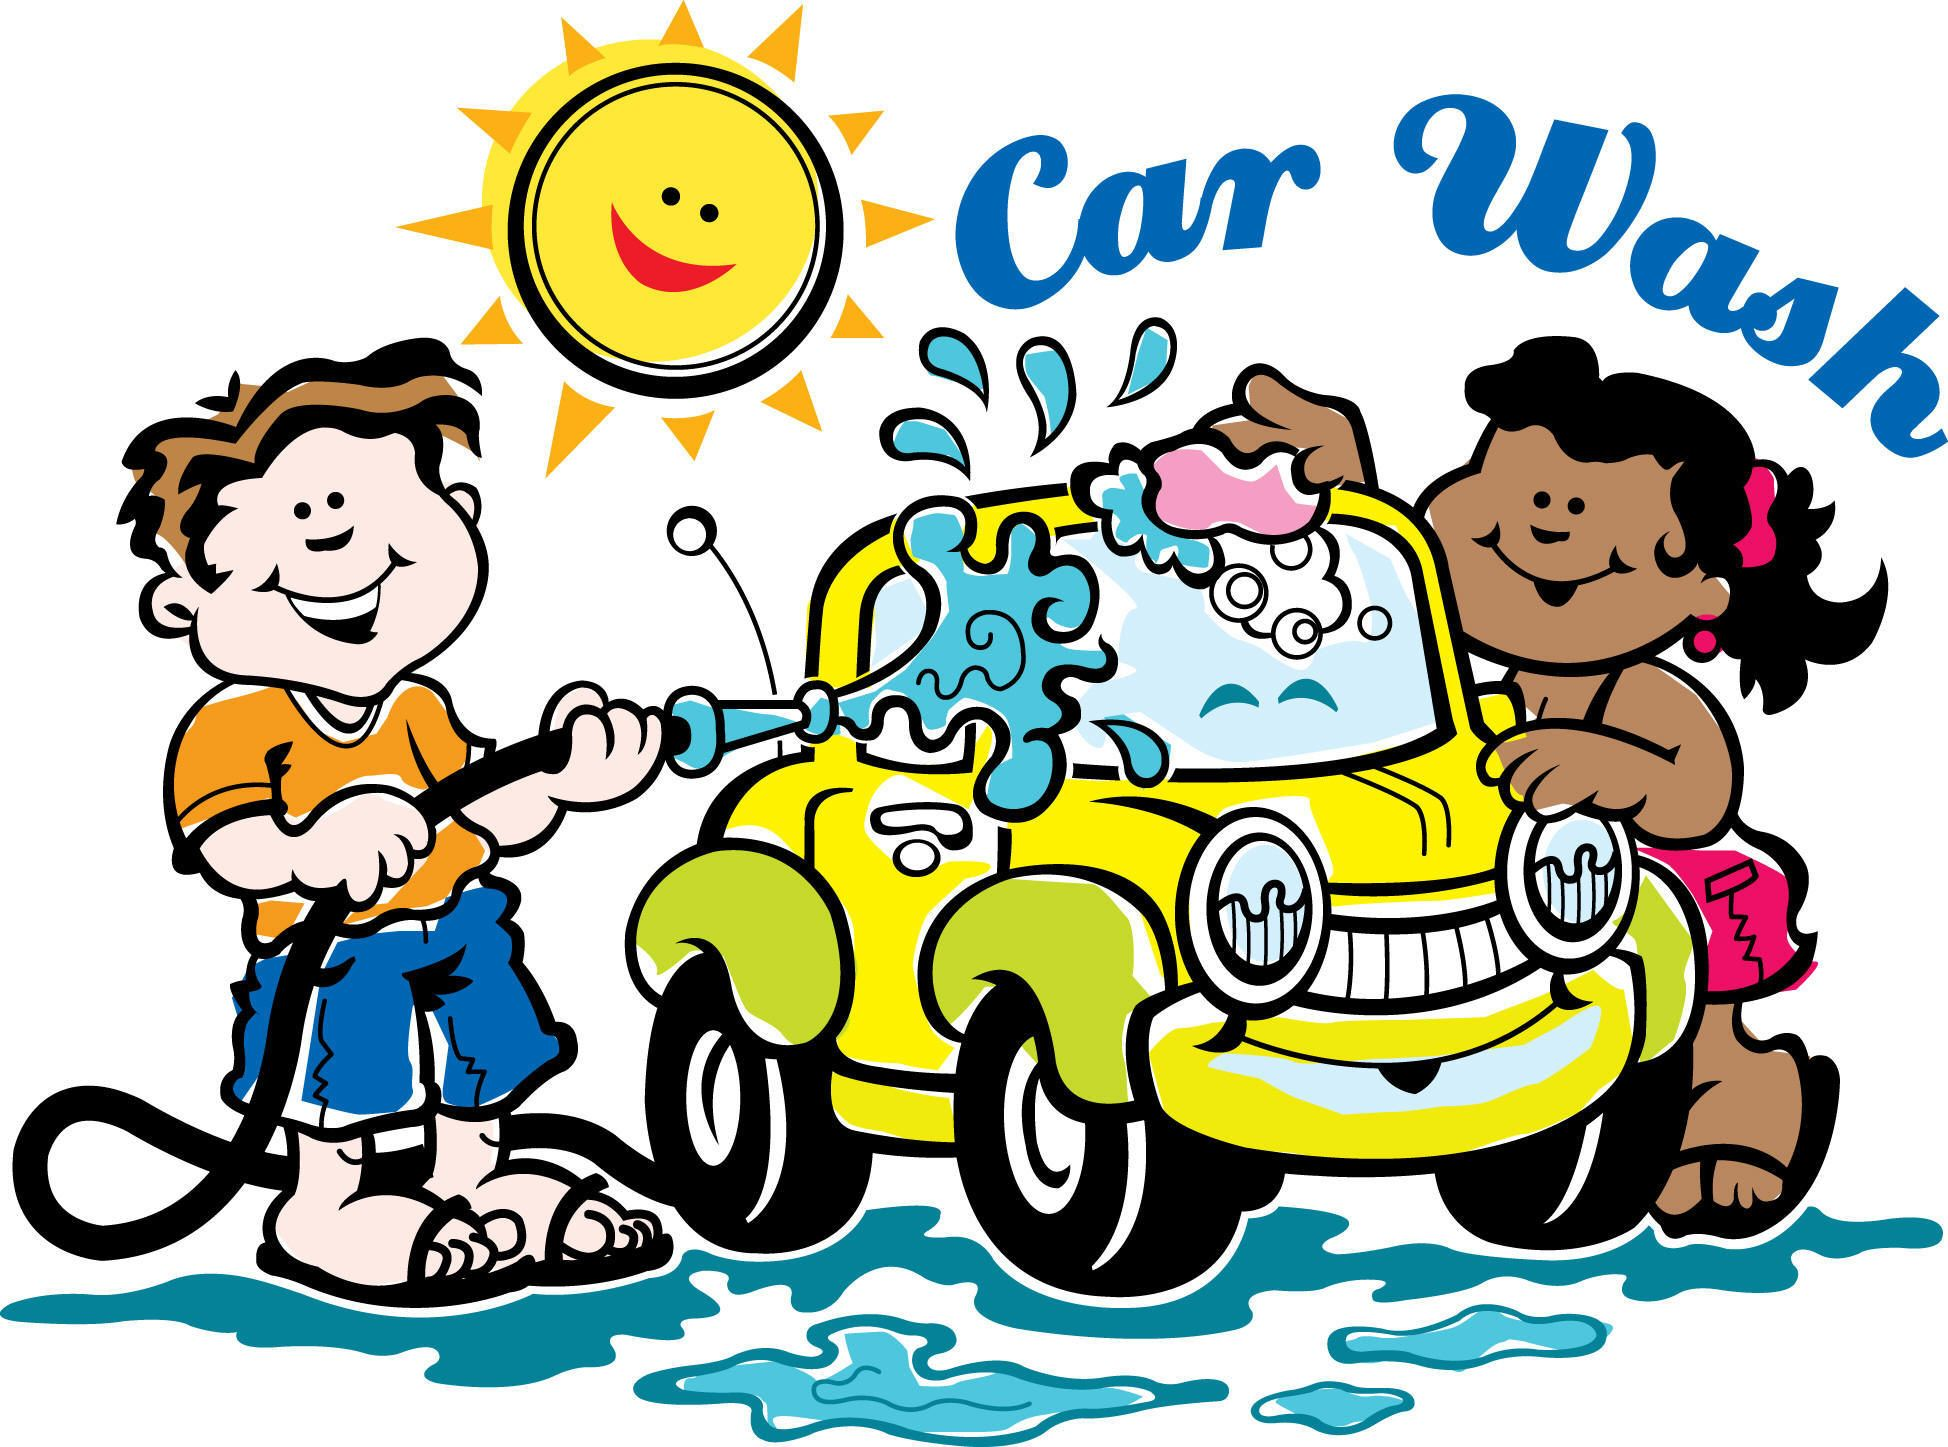 Carwashing clipart picture library download free car wash clip art | Transportation | Car wash, Car cleaning ... picture library download